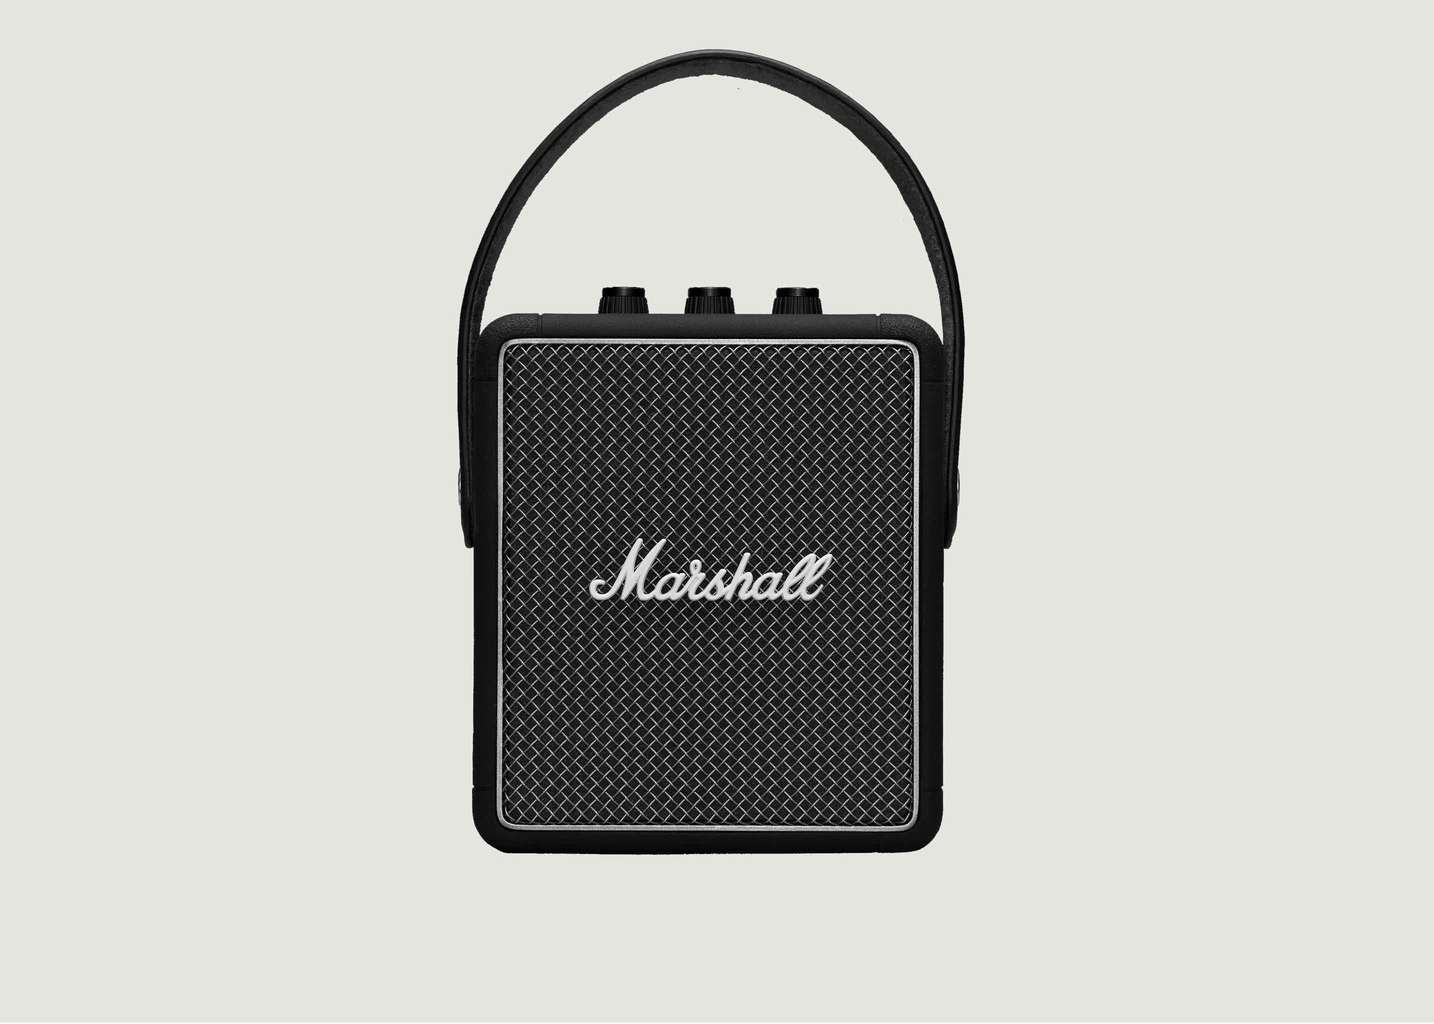 Enceinte Portable Stockwell II - Marshall